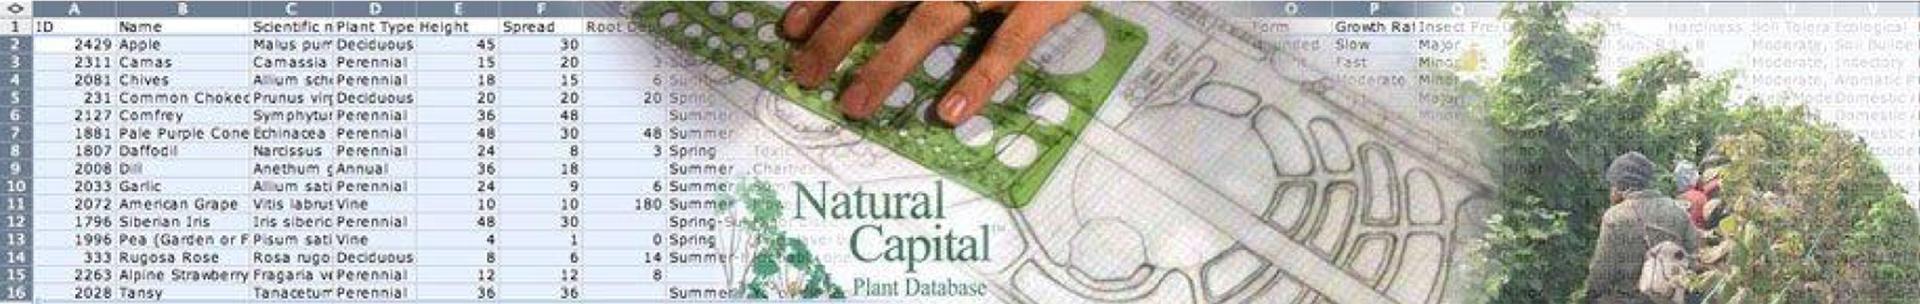 naturalcapital.png